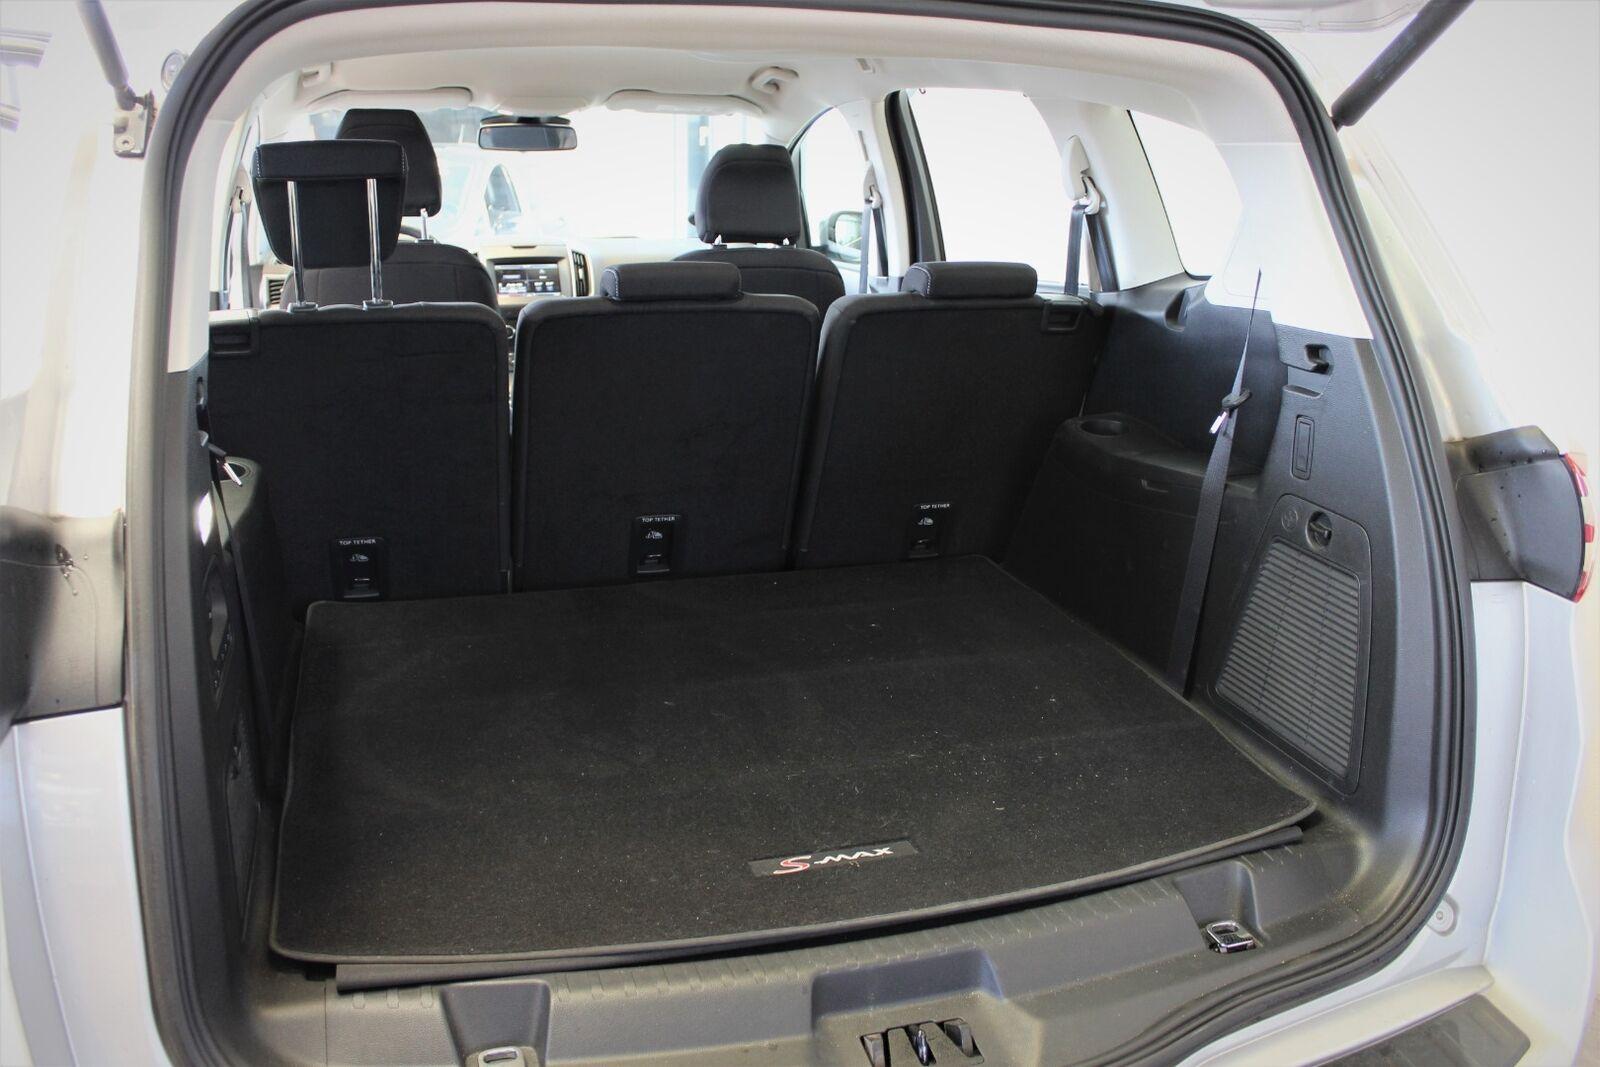 Ford S-MAX 2,0 TDCi 180 Titanium aut. 7prs - billede 14